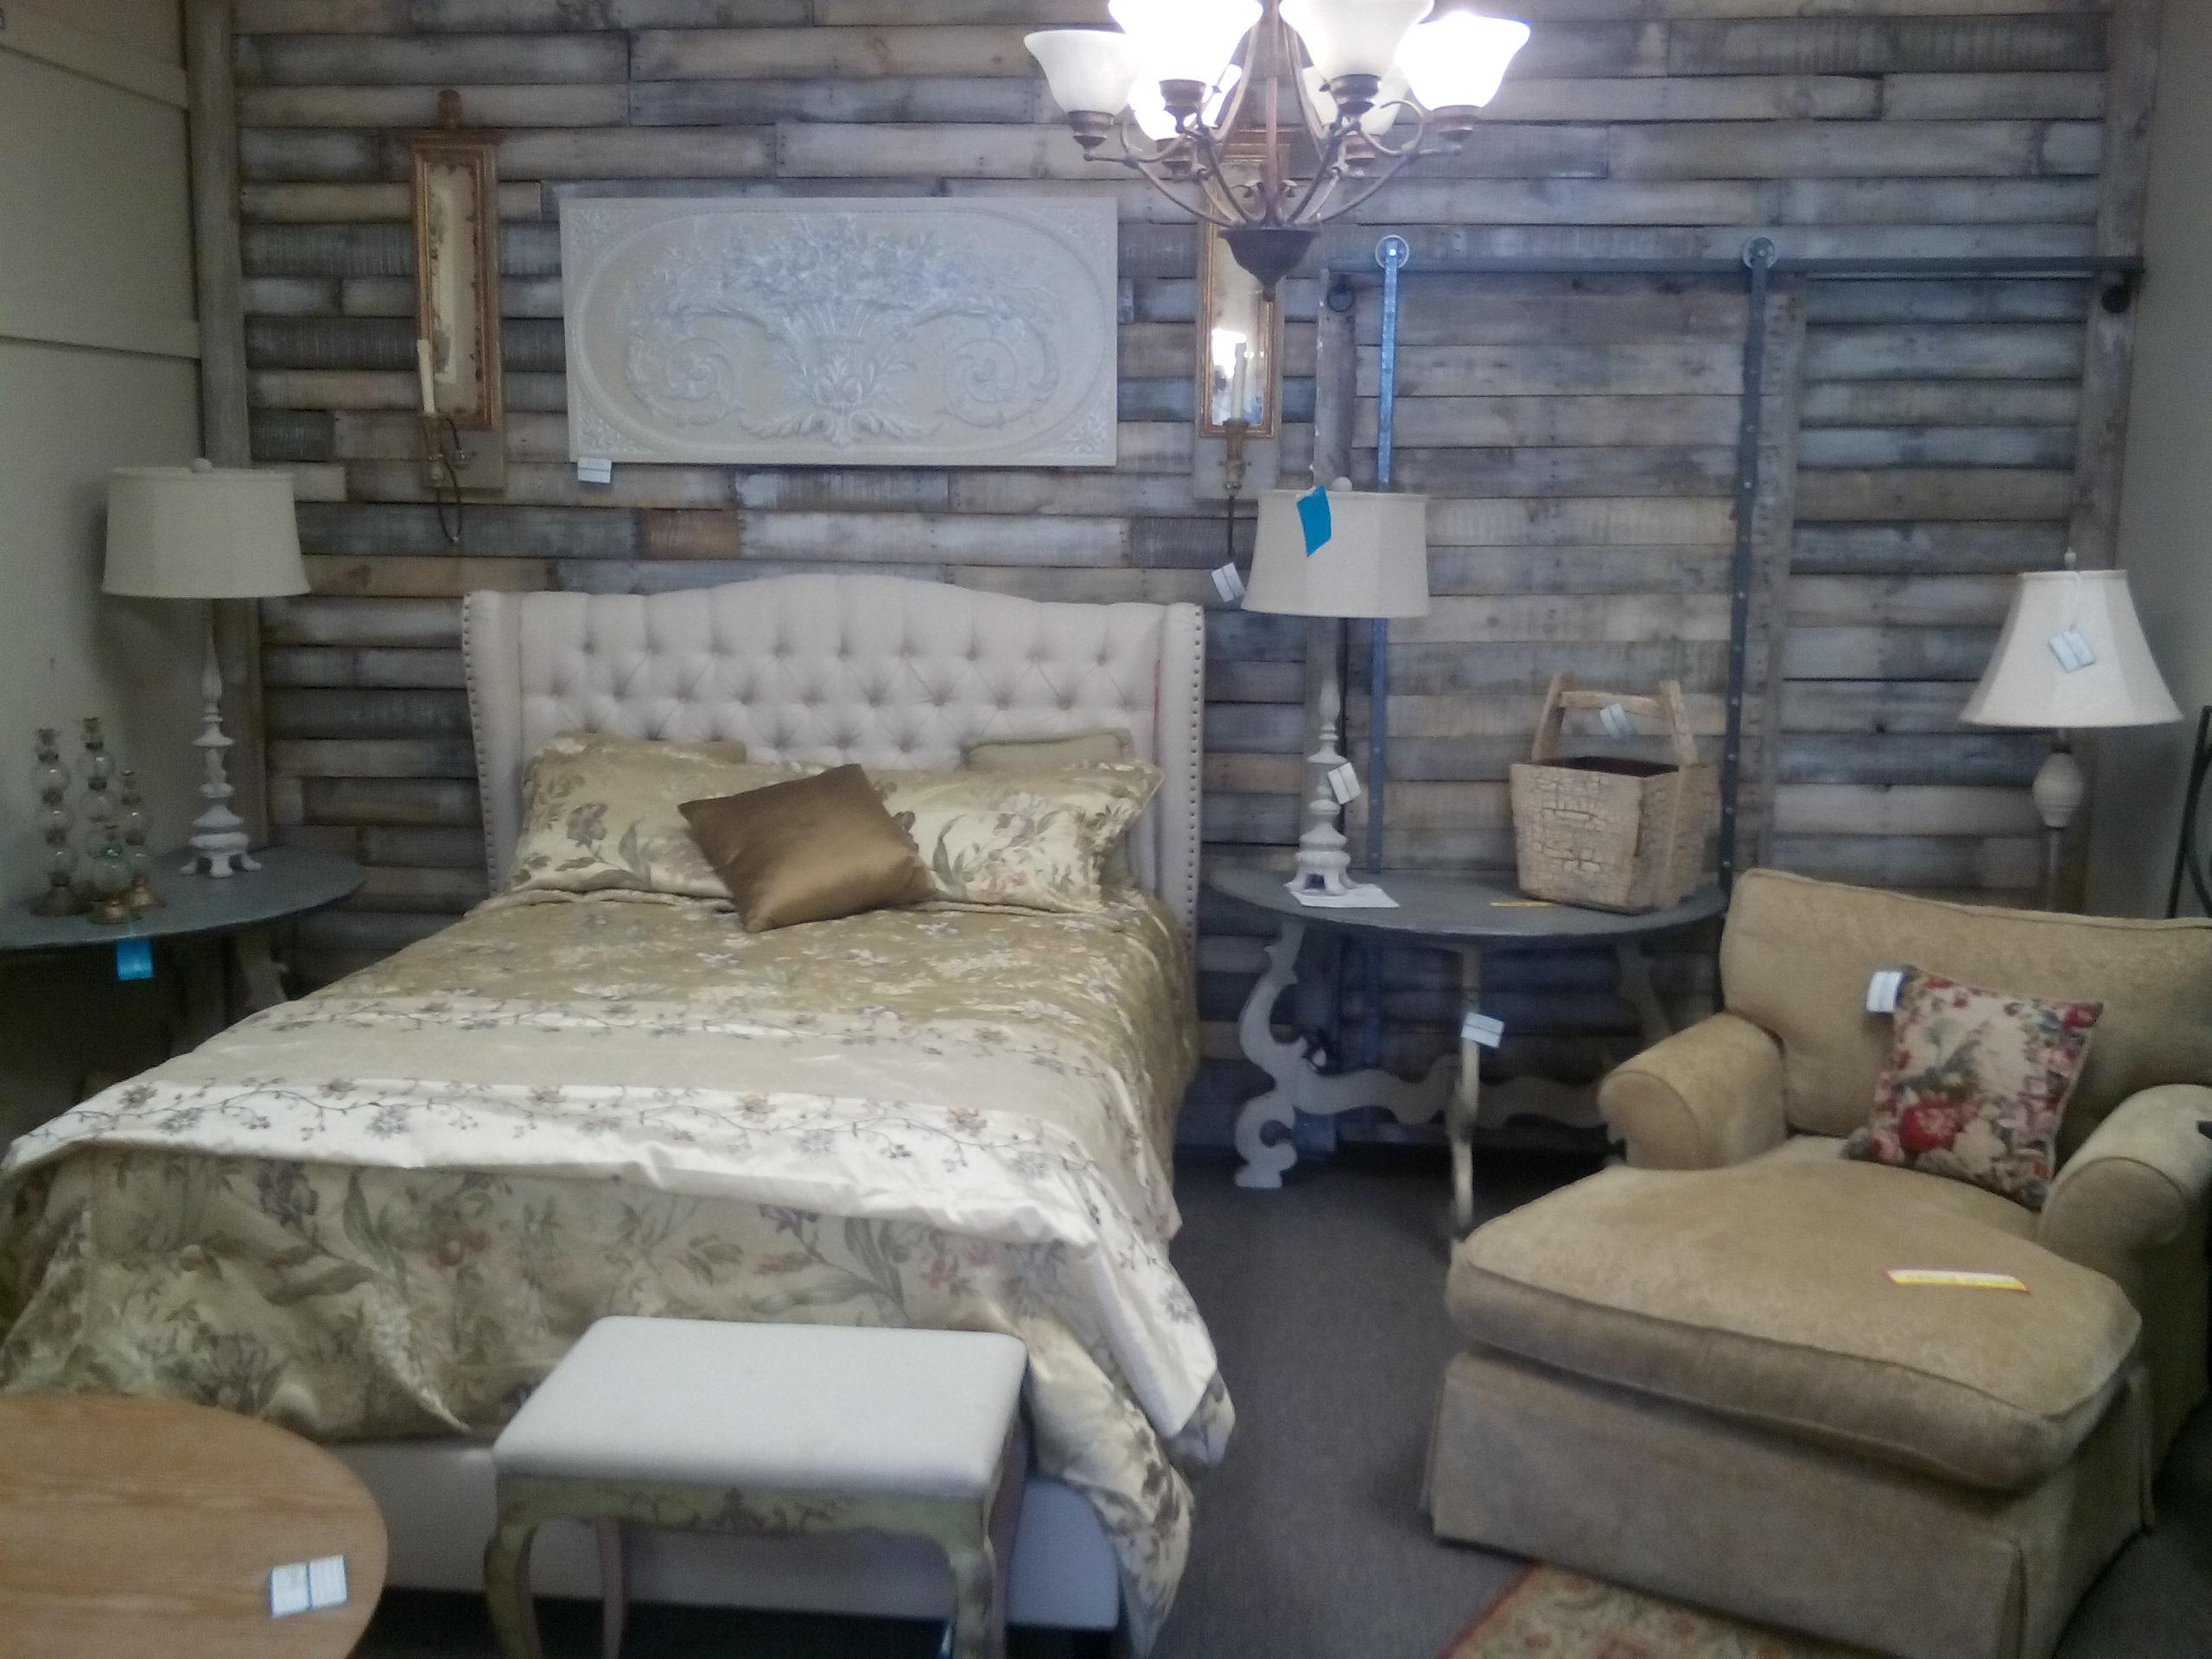 Brysonu0027s Furniture Consignment 9701 Beach Blvd, Jacksonville, FL 32246    YP.com